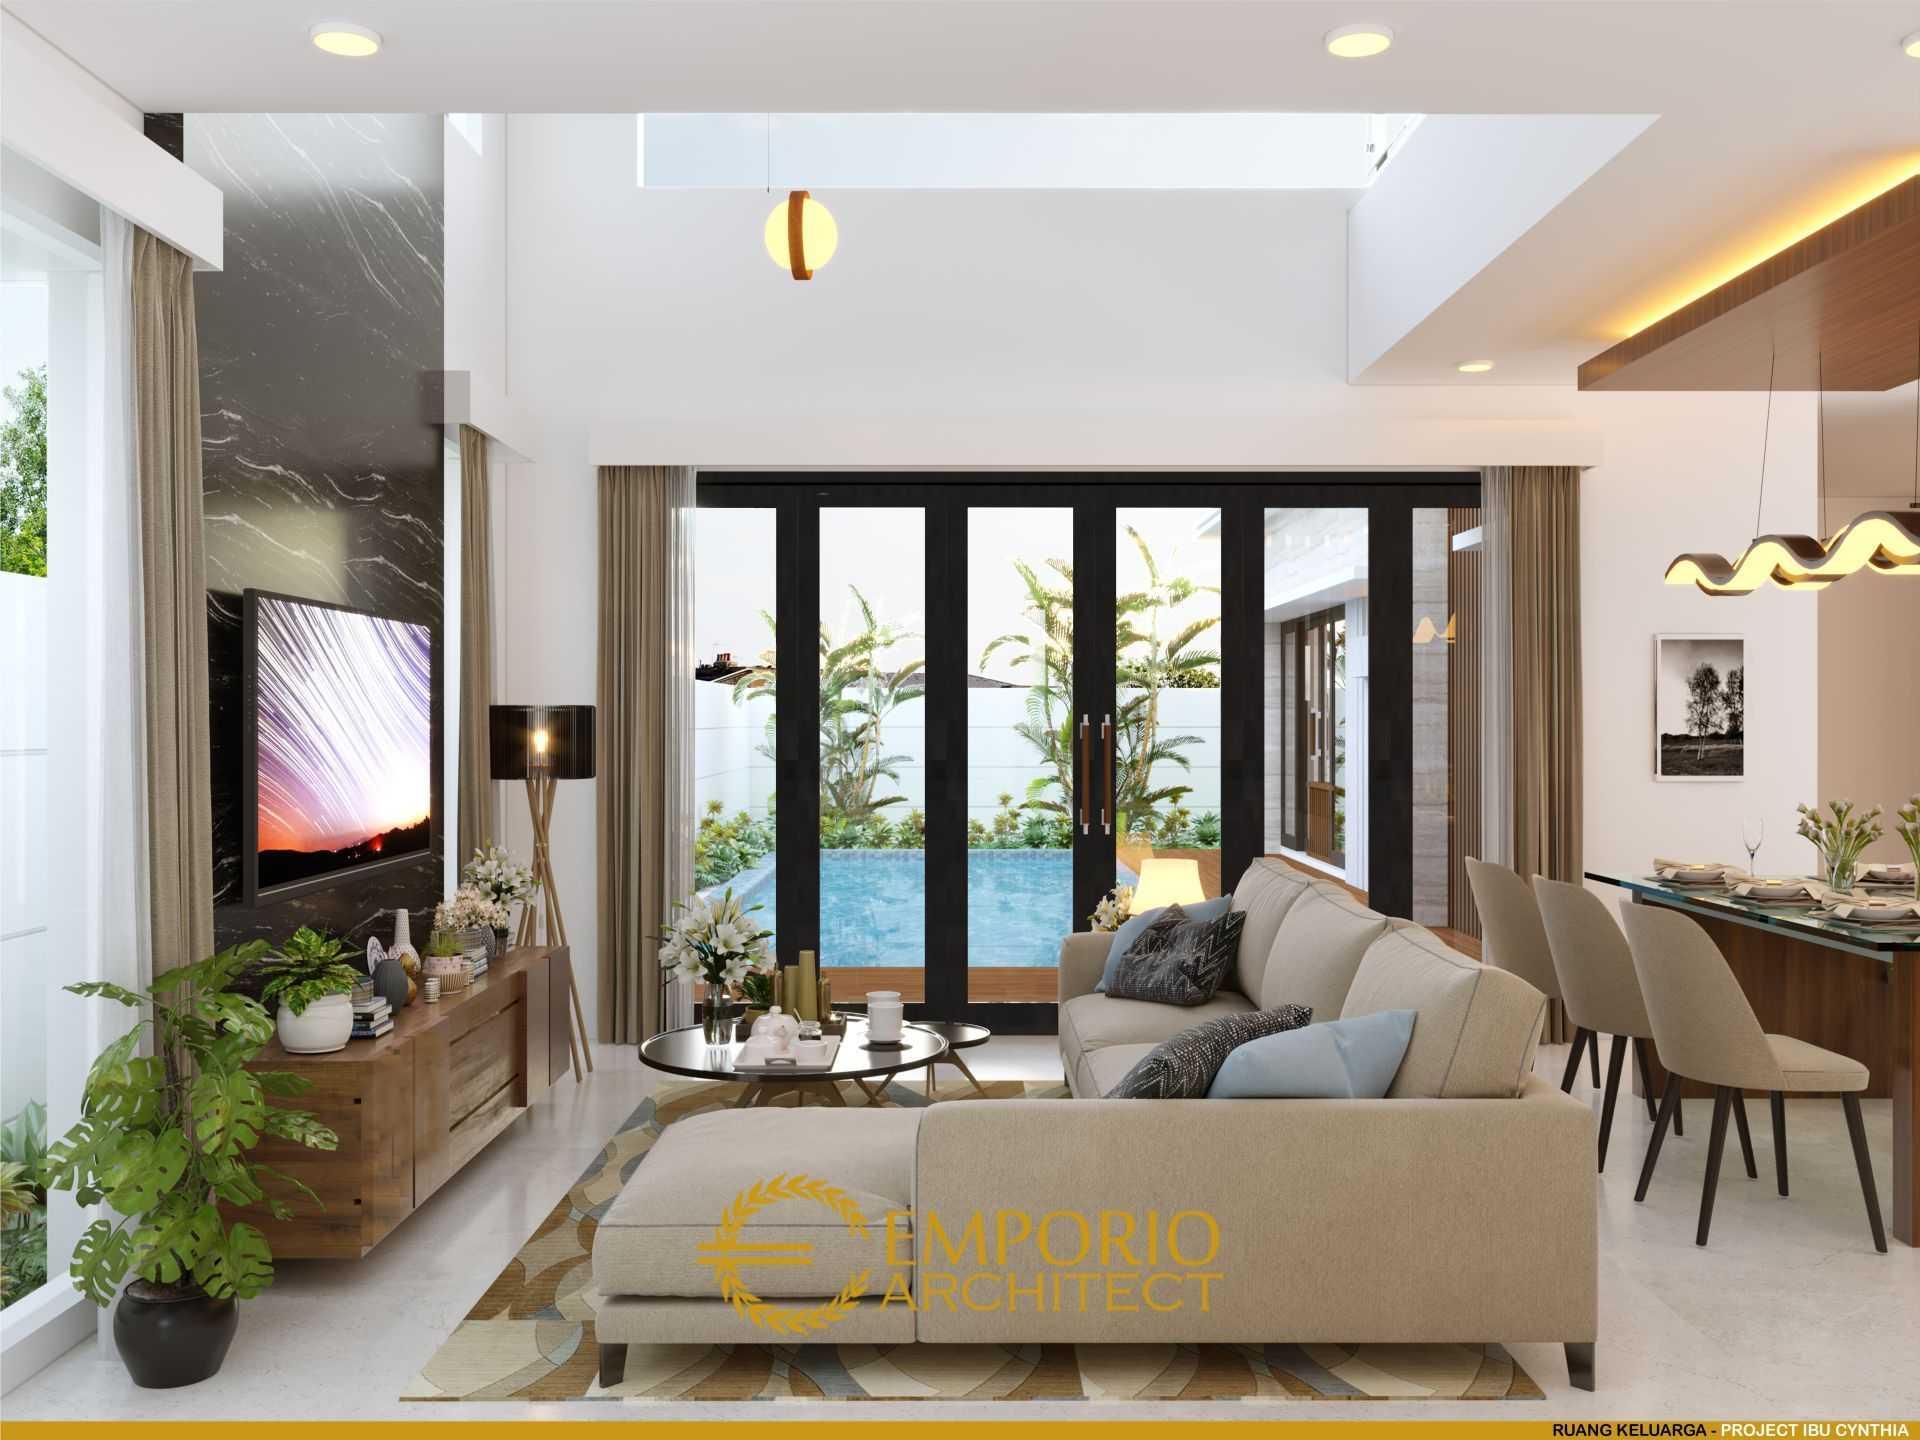 Emporio Architect Jasa Arsitek Pekanbaru Desain Rumah Modern 2 Lantai 824 Di Pekanbaru, Riau Pekanbaru, Kota Pekanbaru, Riau, Indonesia Pekanbaru, Kota Pekanbaru, Riau, Indonesia Emporio-Architect-Jasa-Arsitek-Pekanbaru-Desain-Rumah-Modern-2-Lantai-824-Di-Pekanbaru-Riau   94135